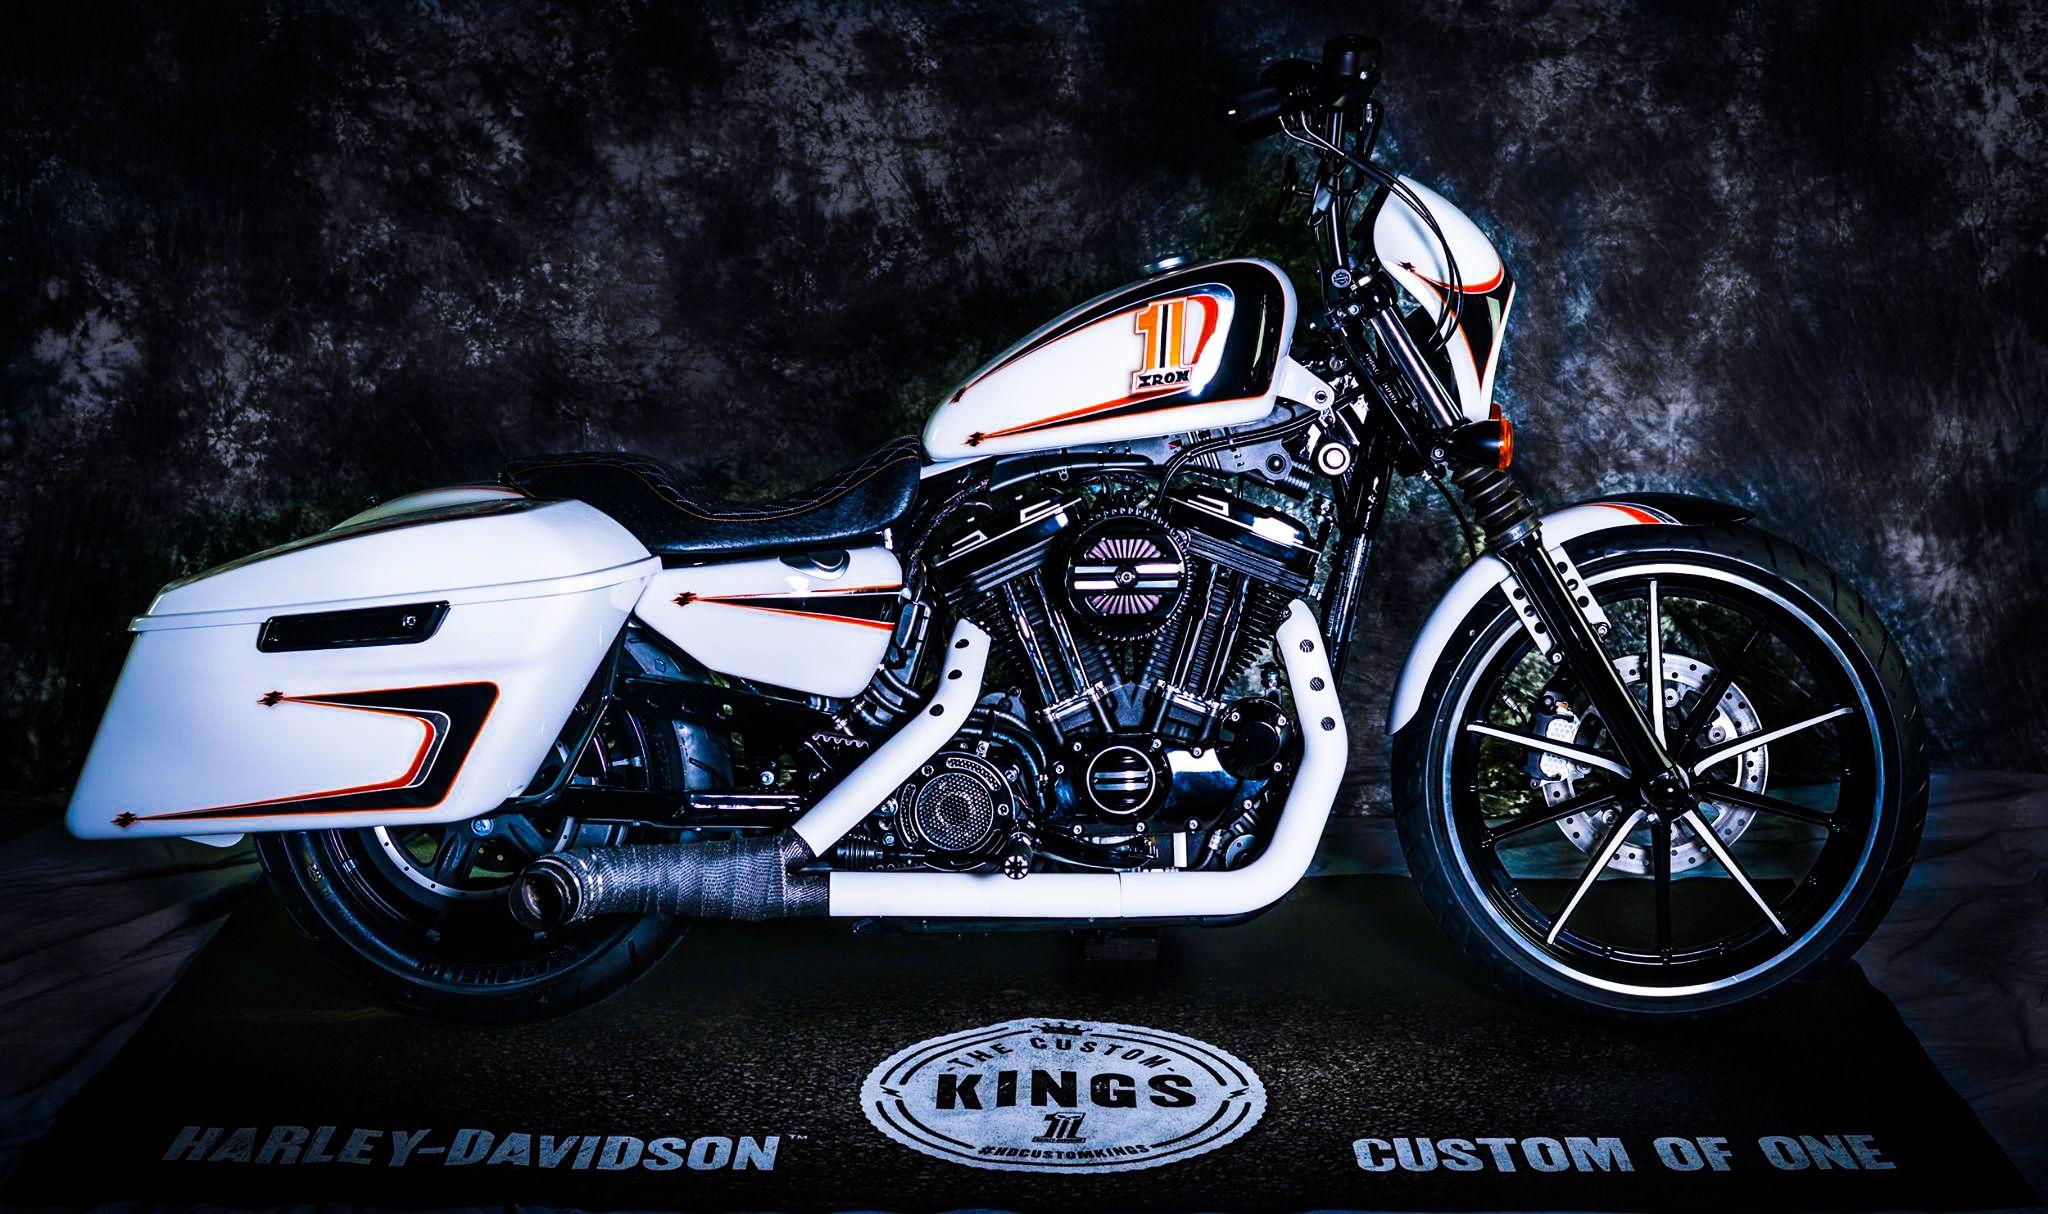 Four Rivers Harley-Davidson Paducah, Kentucky - 2016 H-D® Sportster